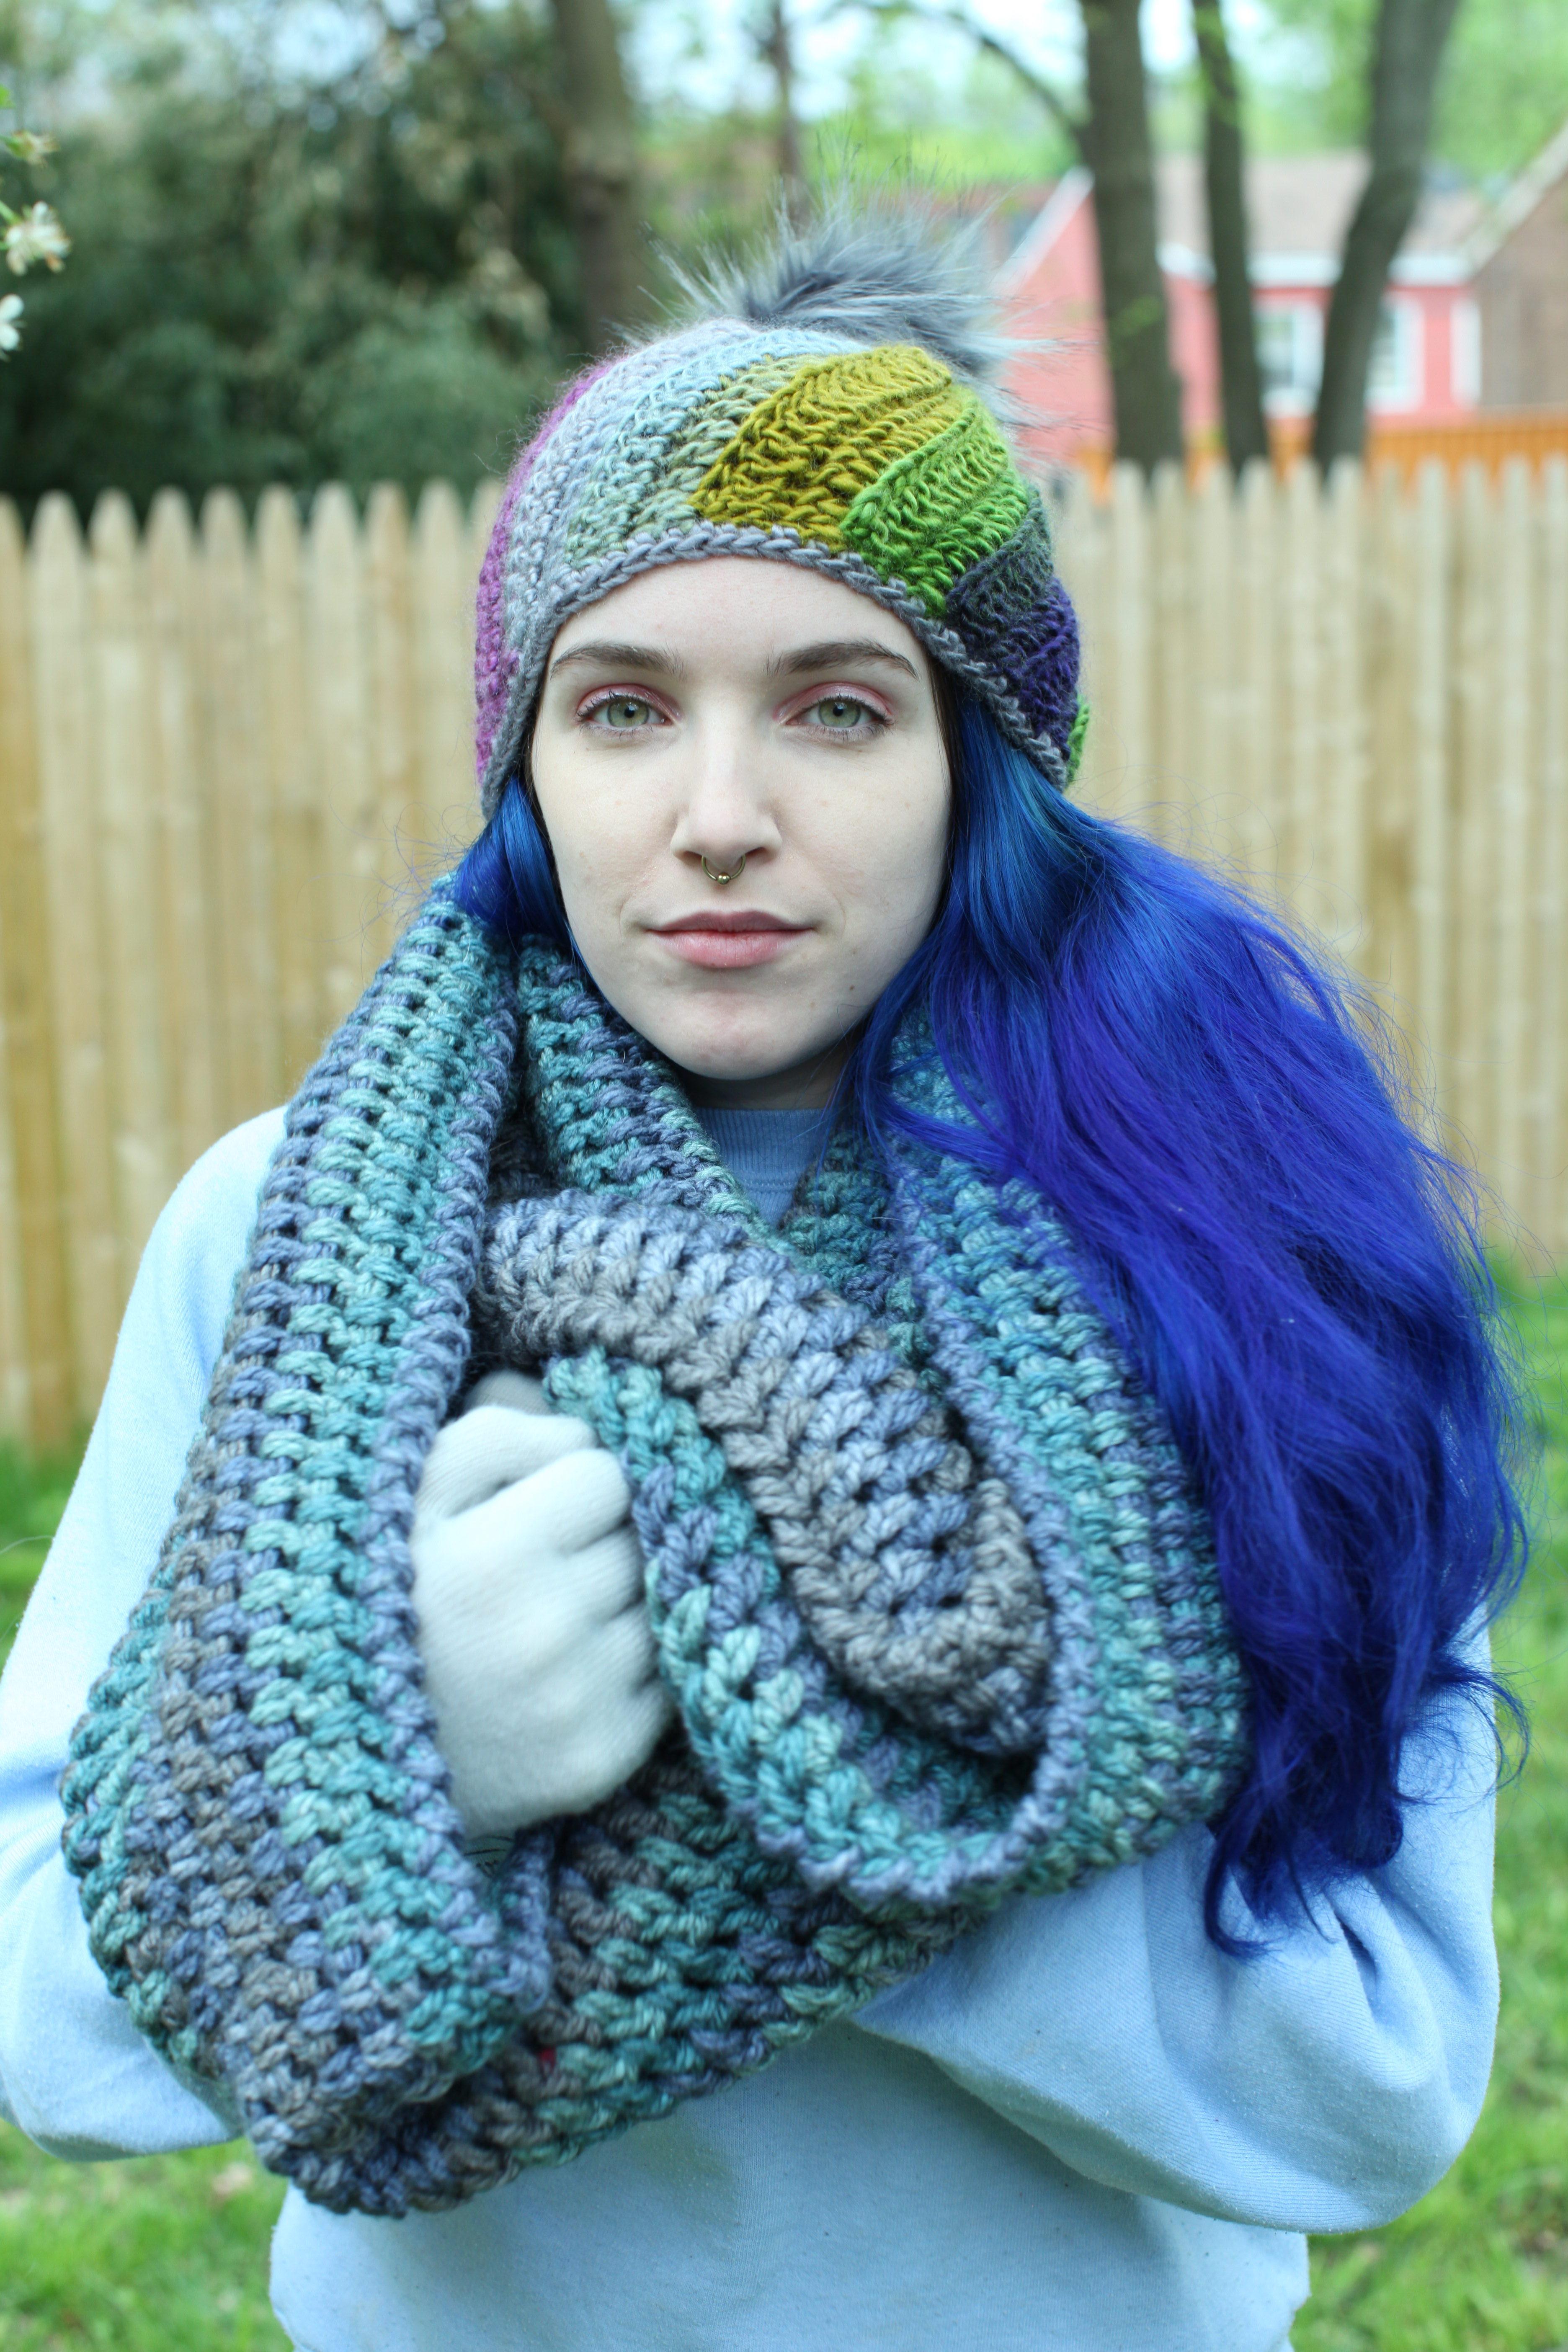 Crochet A Mobius Scarf